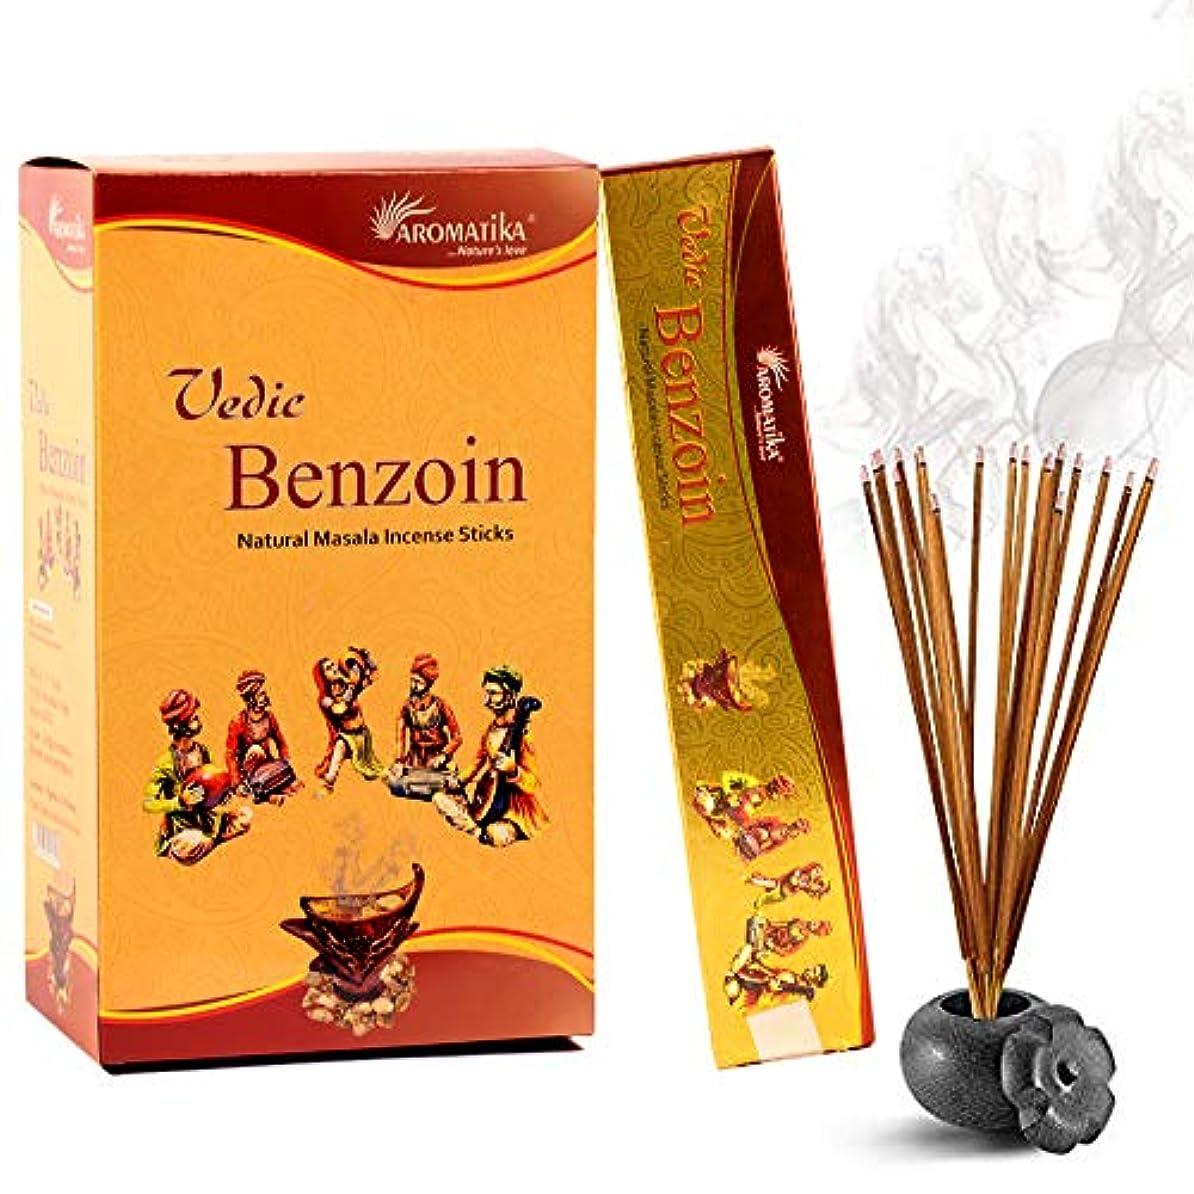 aromatika Benzoin 15 gms Masala Incense Sticks Pack of 12